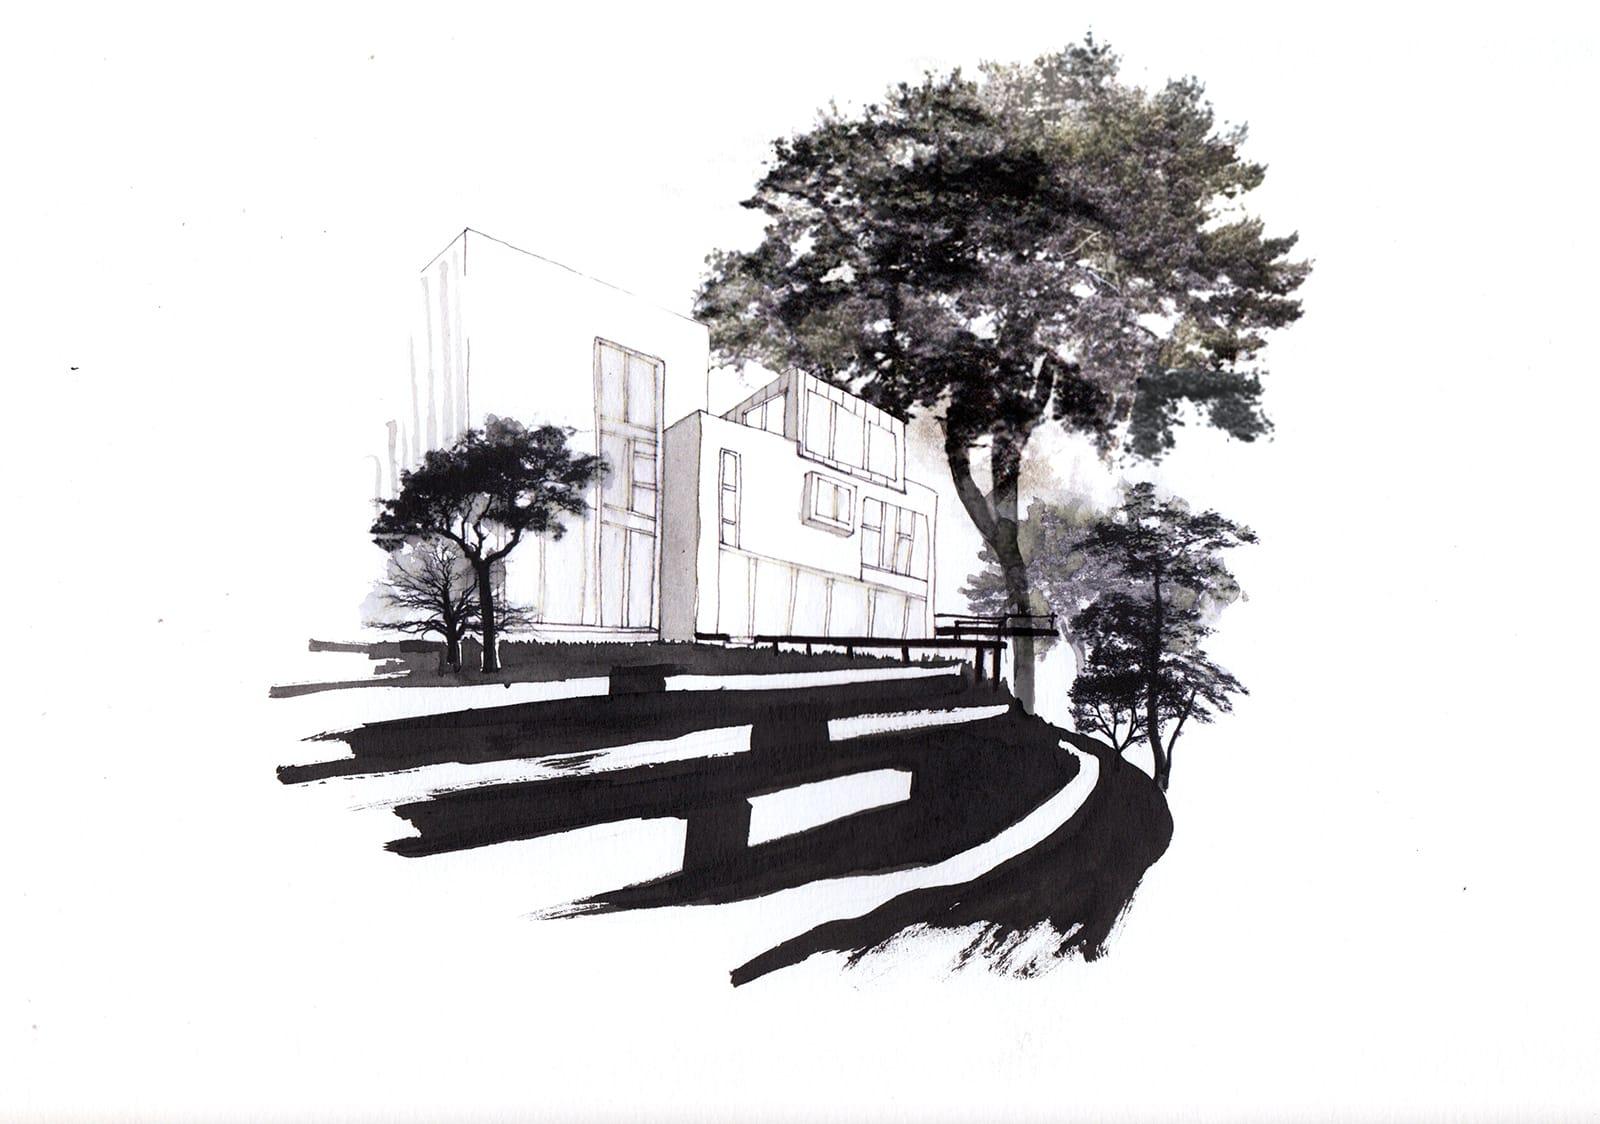 dessin Esquisse Jardin pente perché pillotis terrasse muret soutainement®hermelinecarpentier